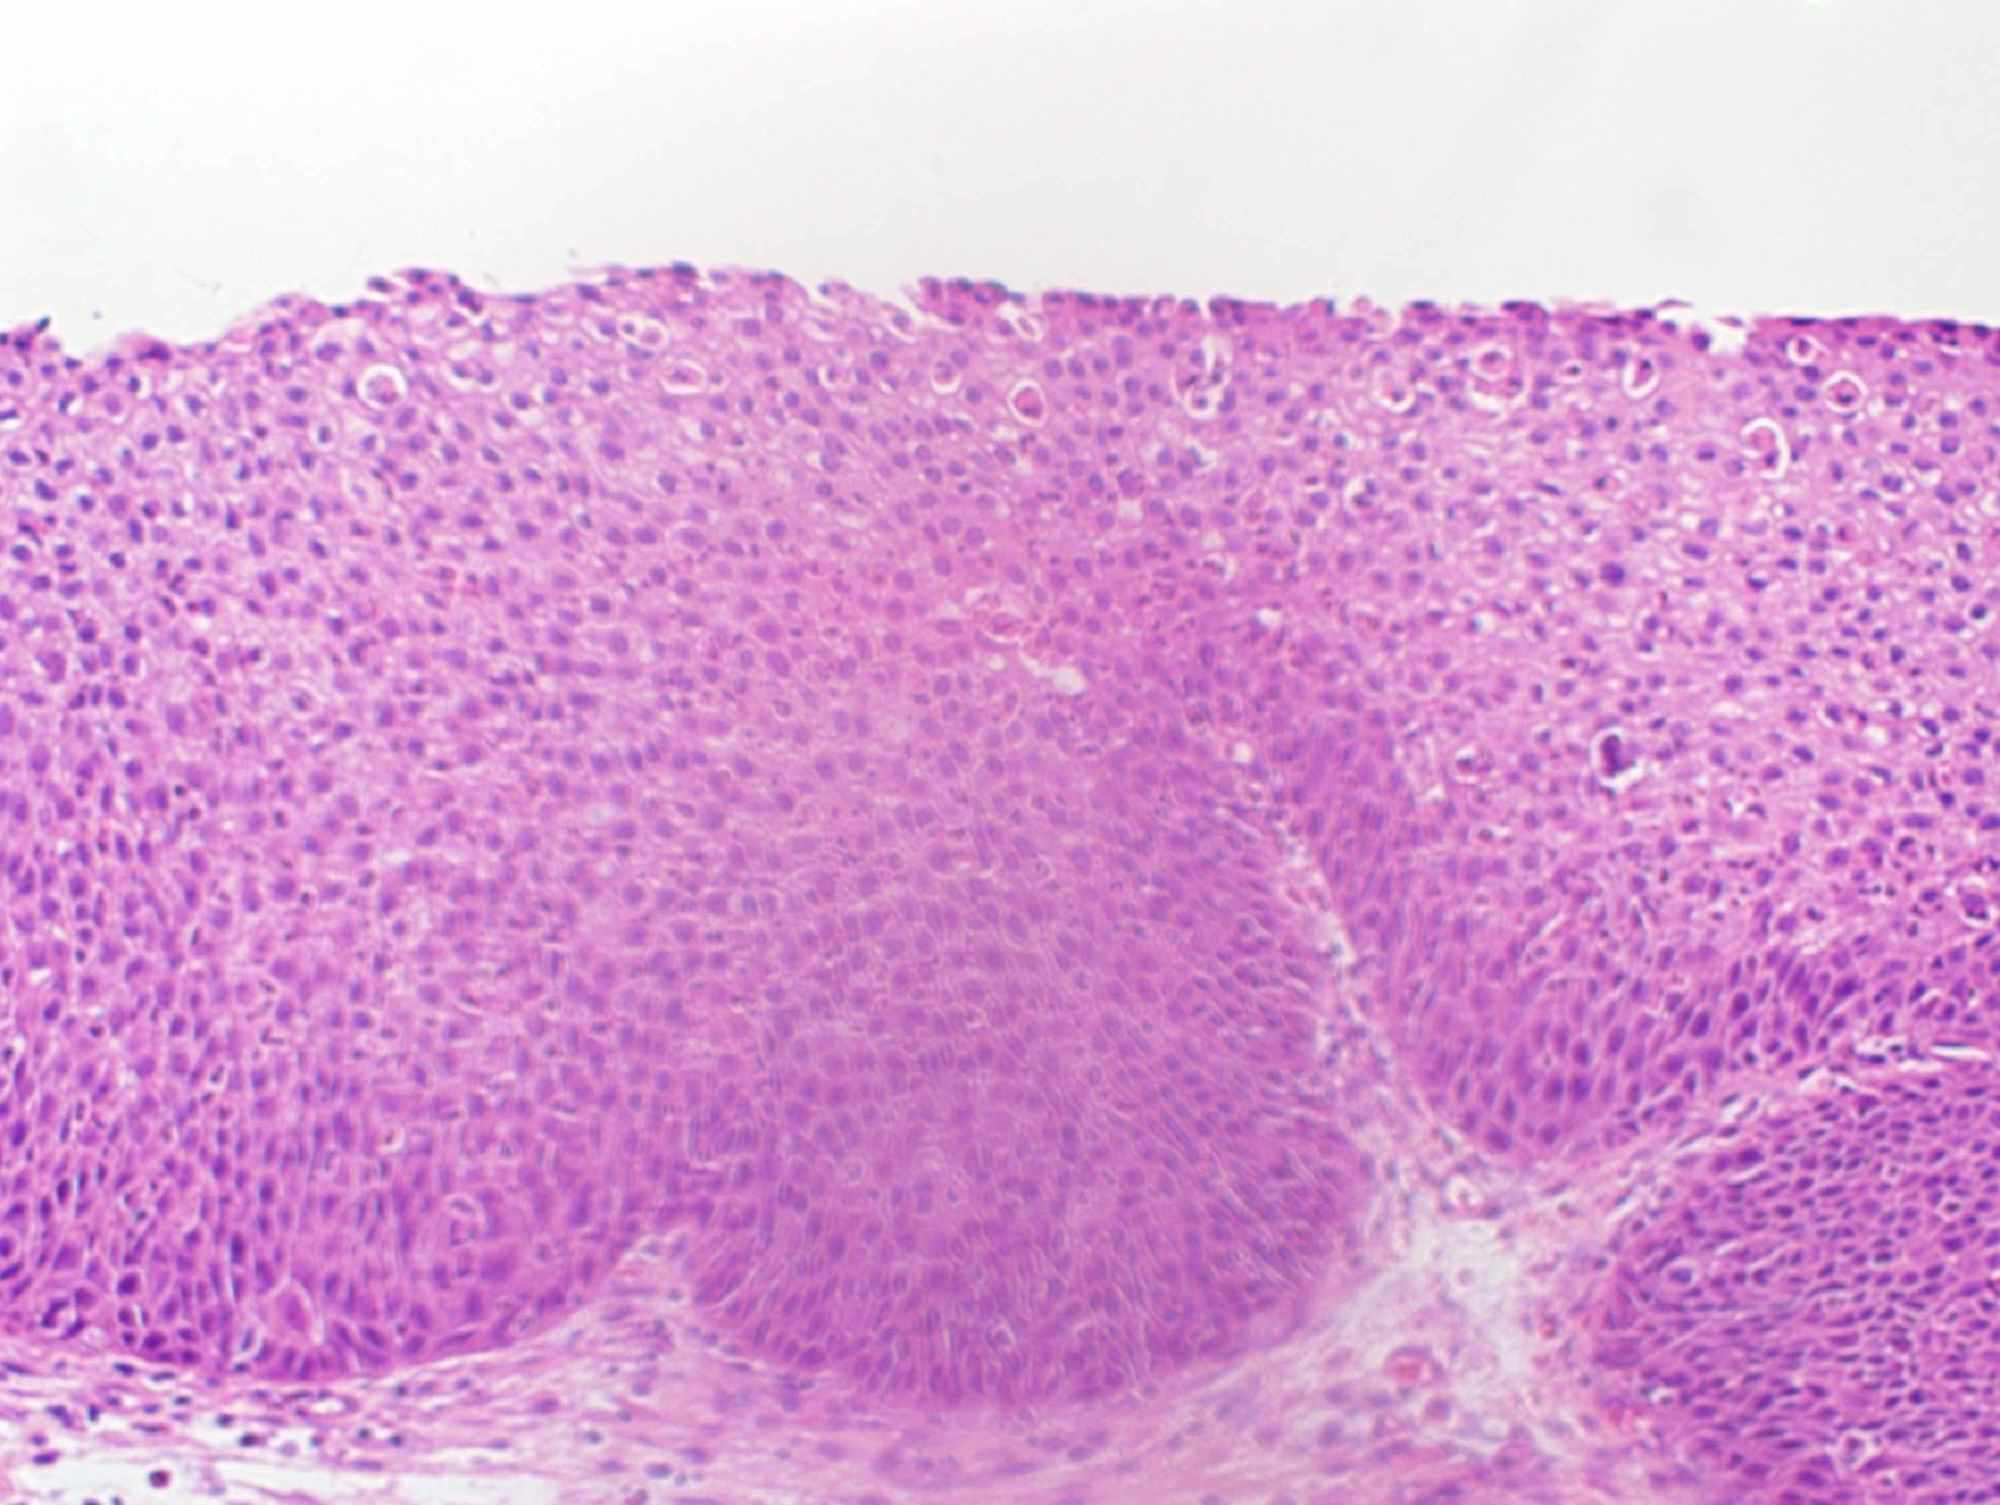 micro papillomas